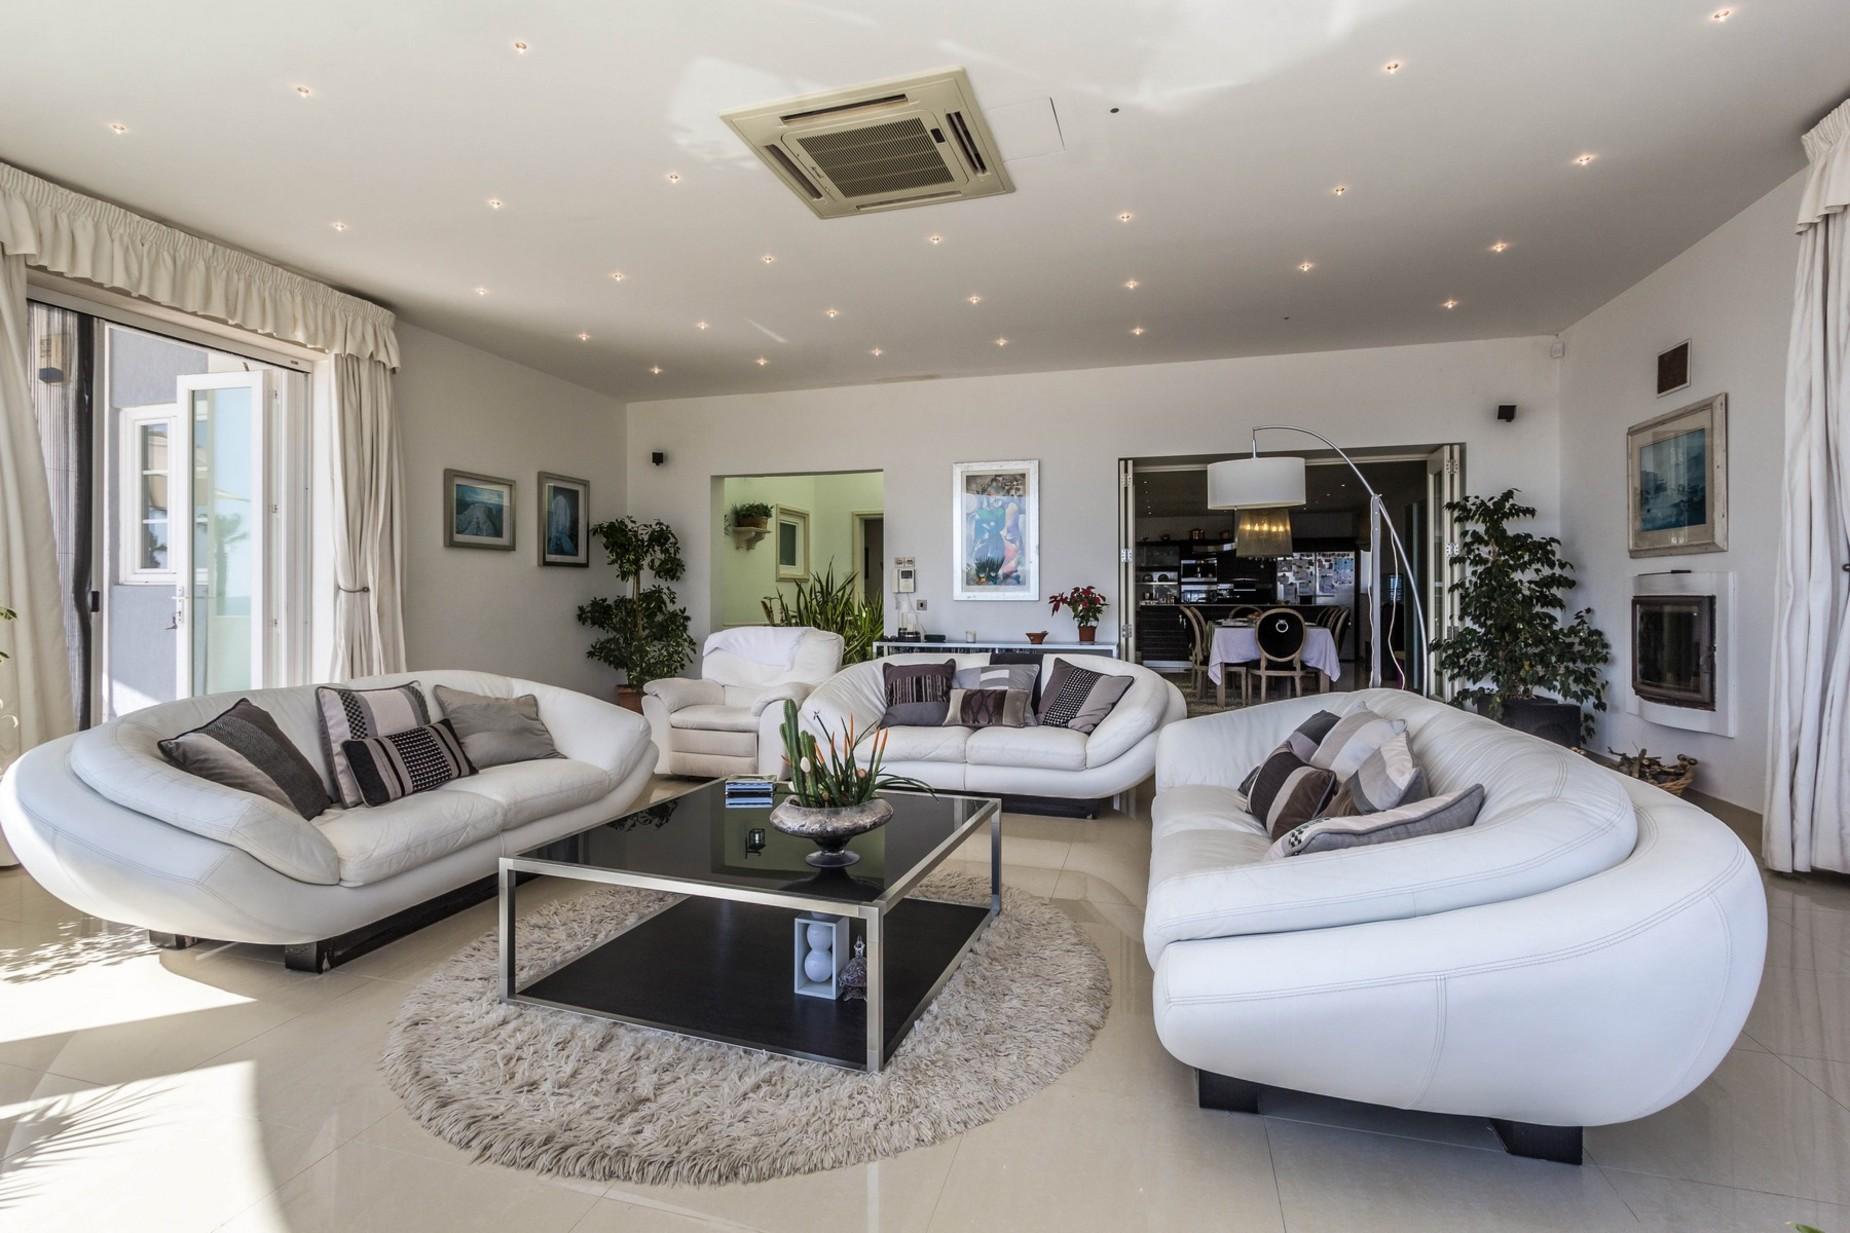 3 bed Villa For Sale in Marsascala, Marsascala - thumb 22